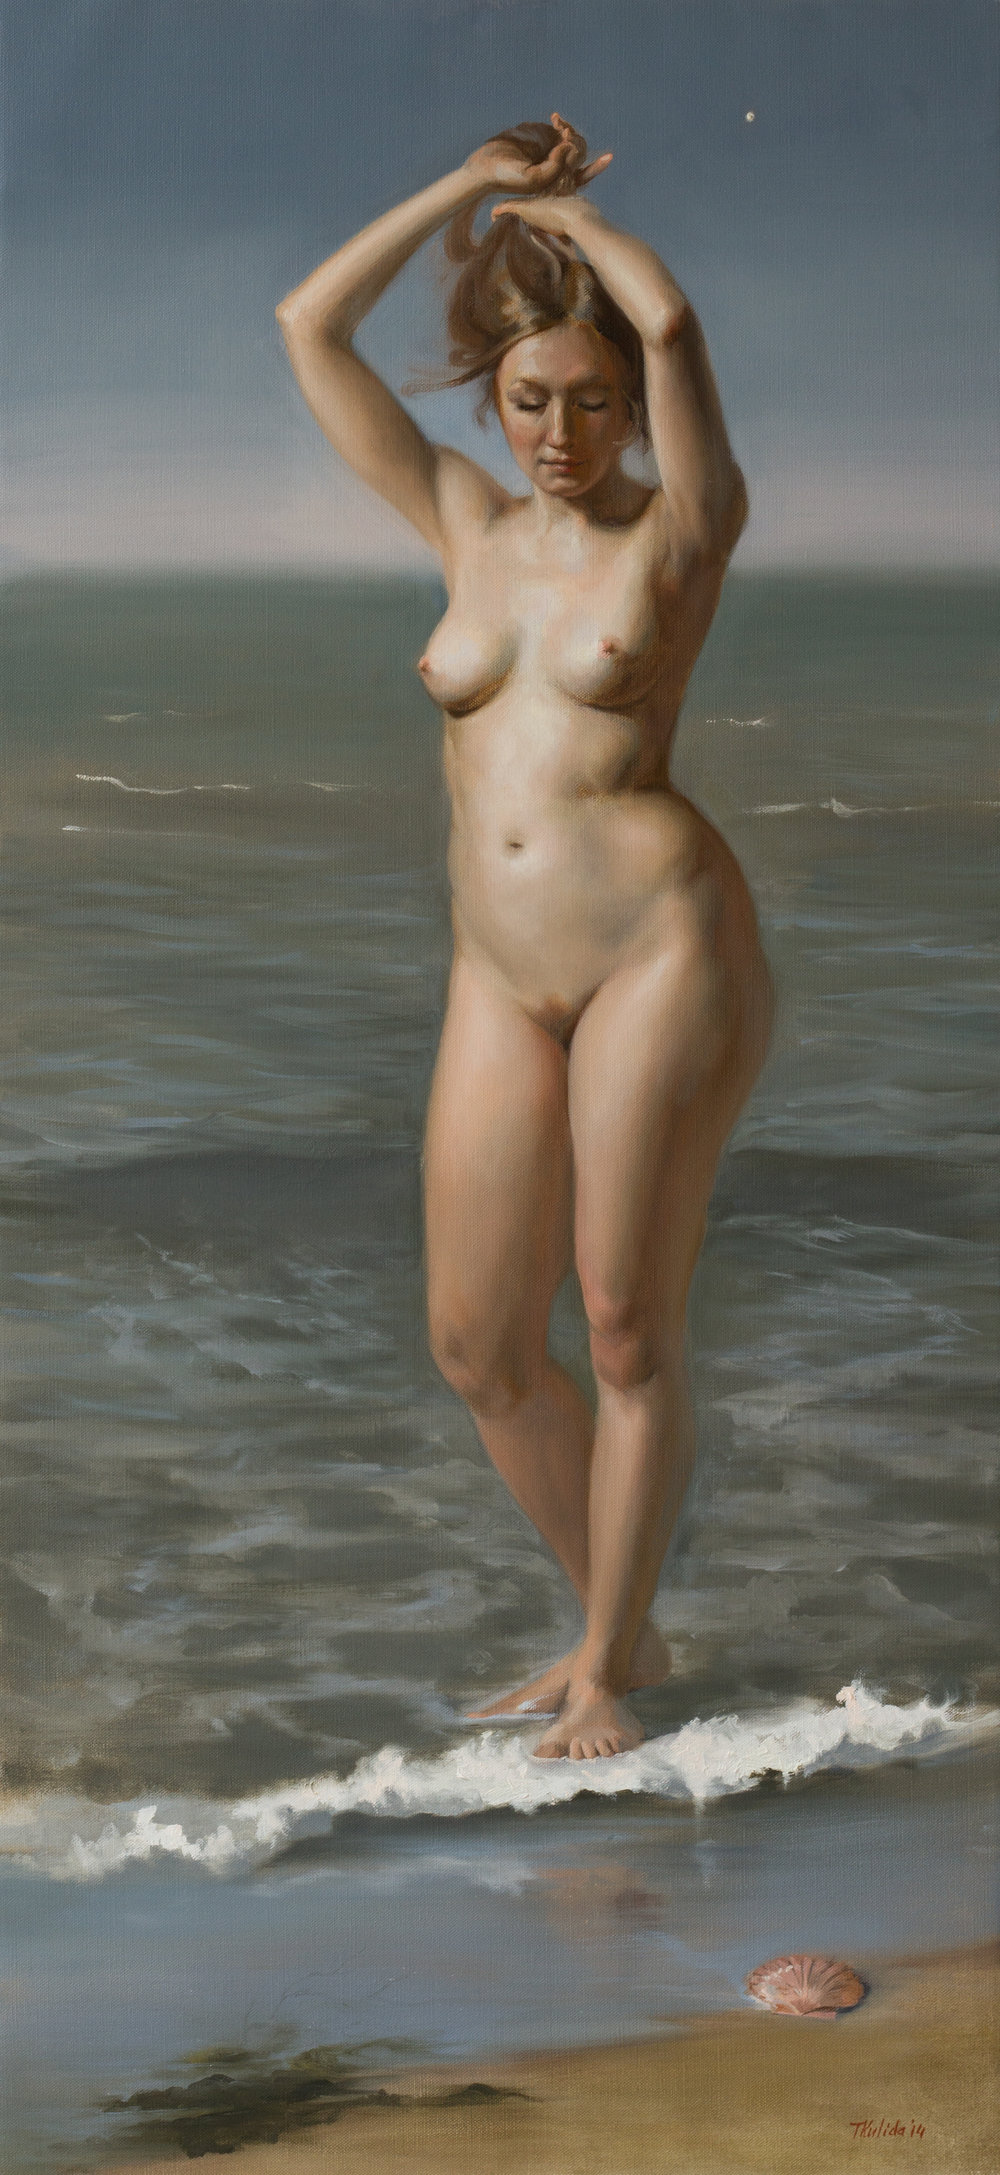 Venus, oil on linen, 150x70, framed, April 2014